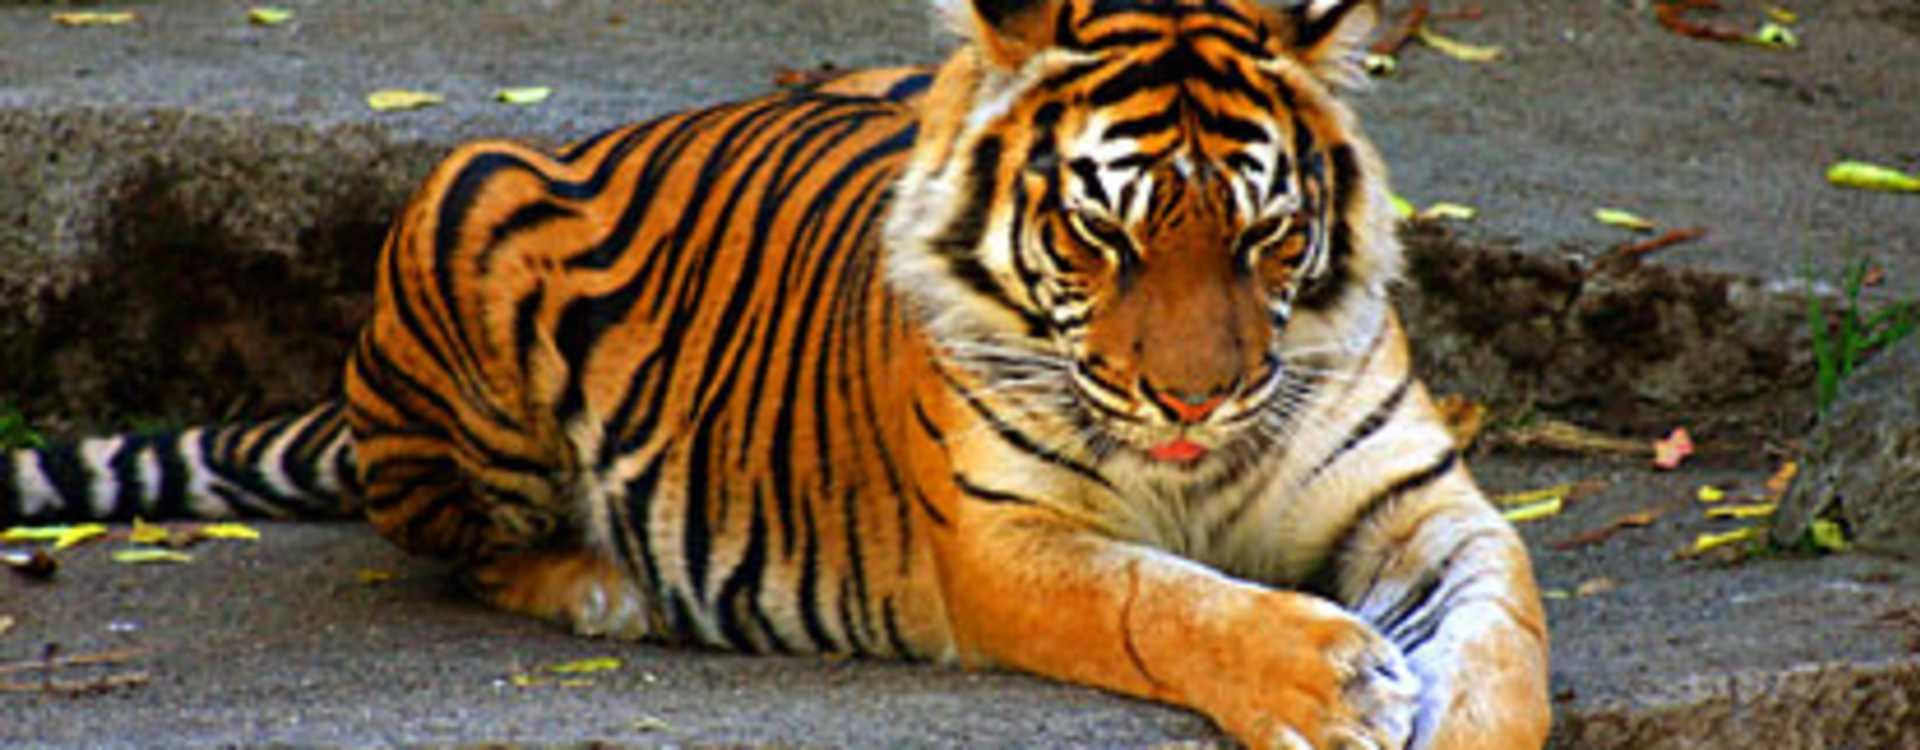 Woodland_Park_Zoo.jpg